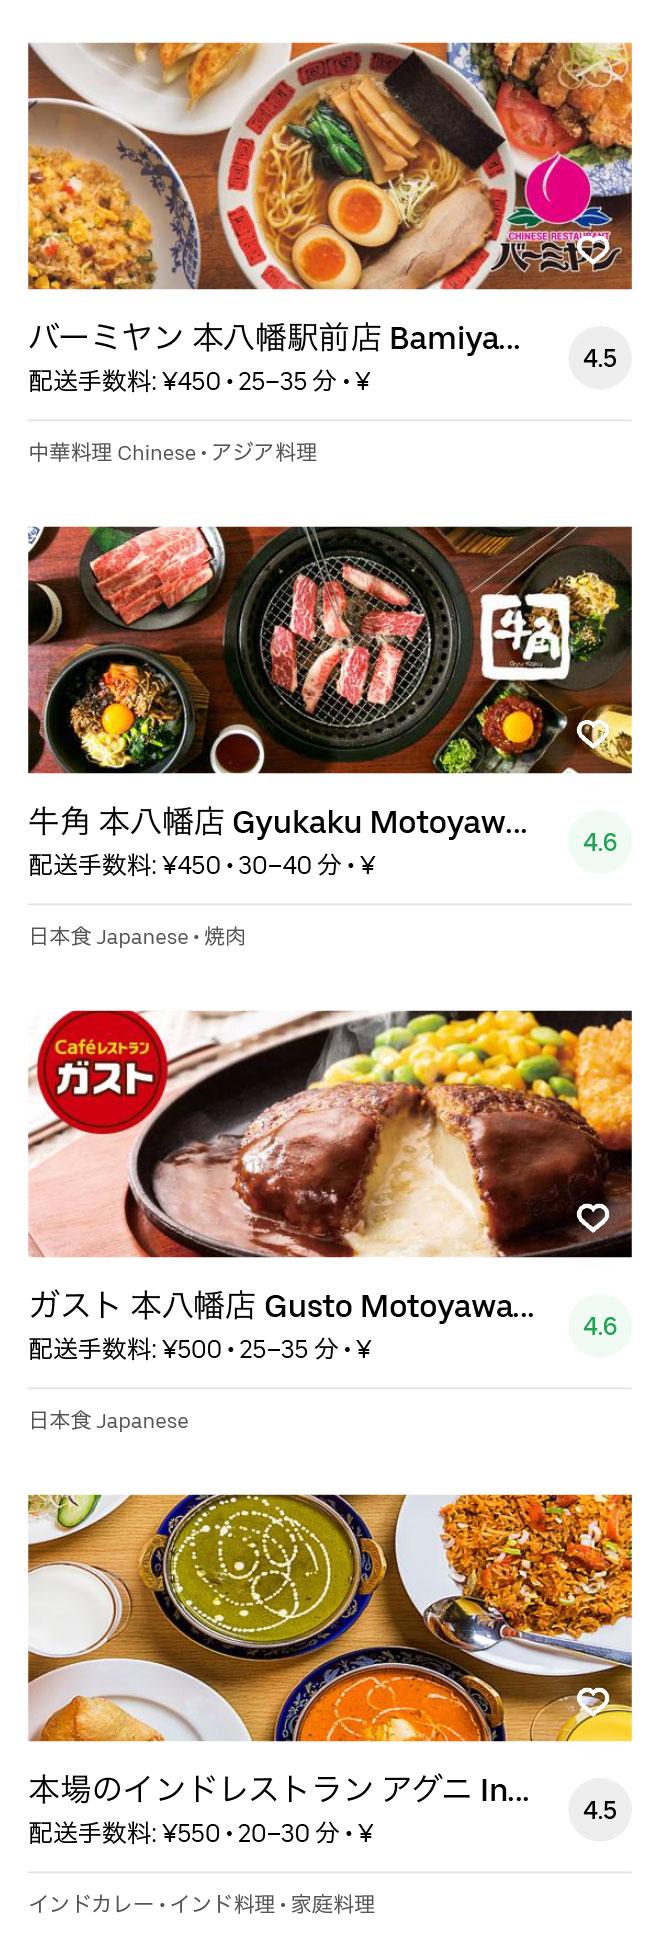 Funabashi nishi menu 2004 09